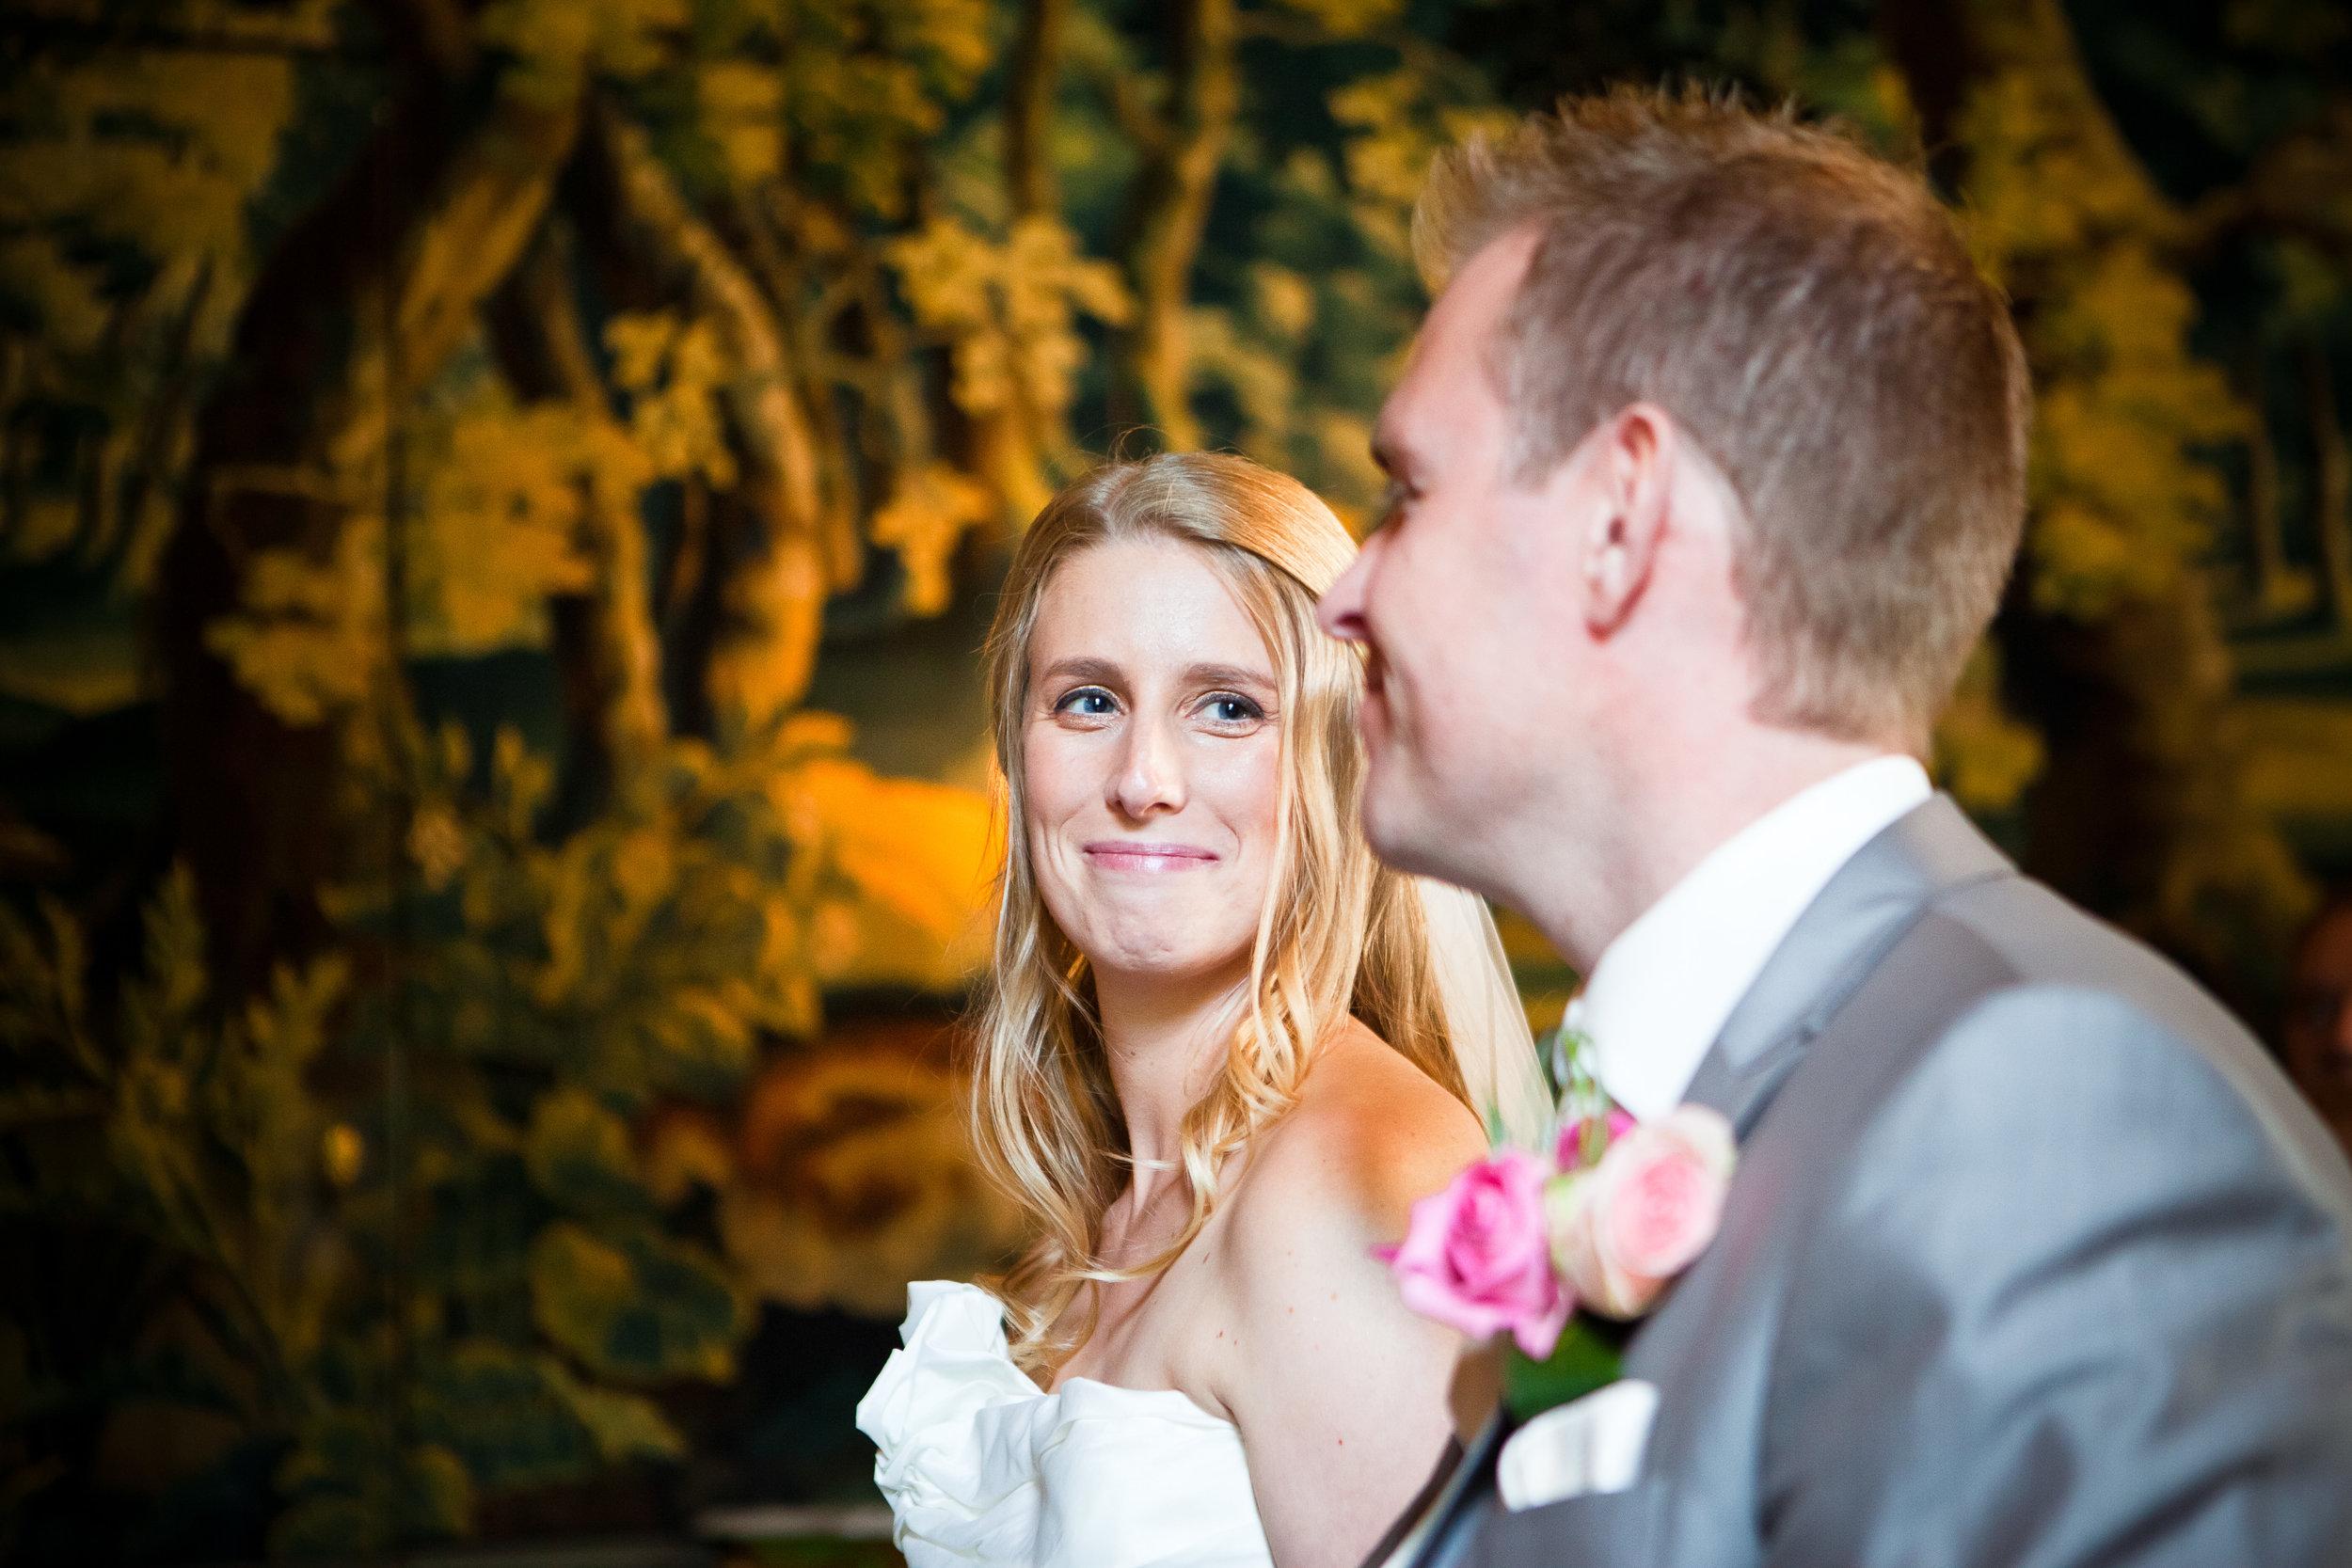 trouwshoot-bruidsfotografie-trouwfoto-feestfotografie-trouwreportage-Jan en Loes588.jpg